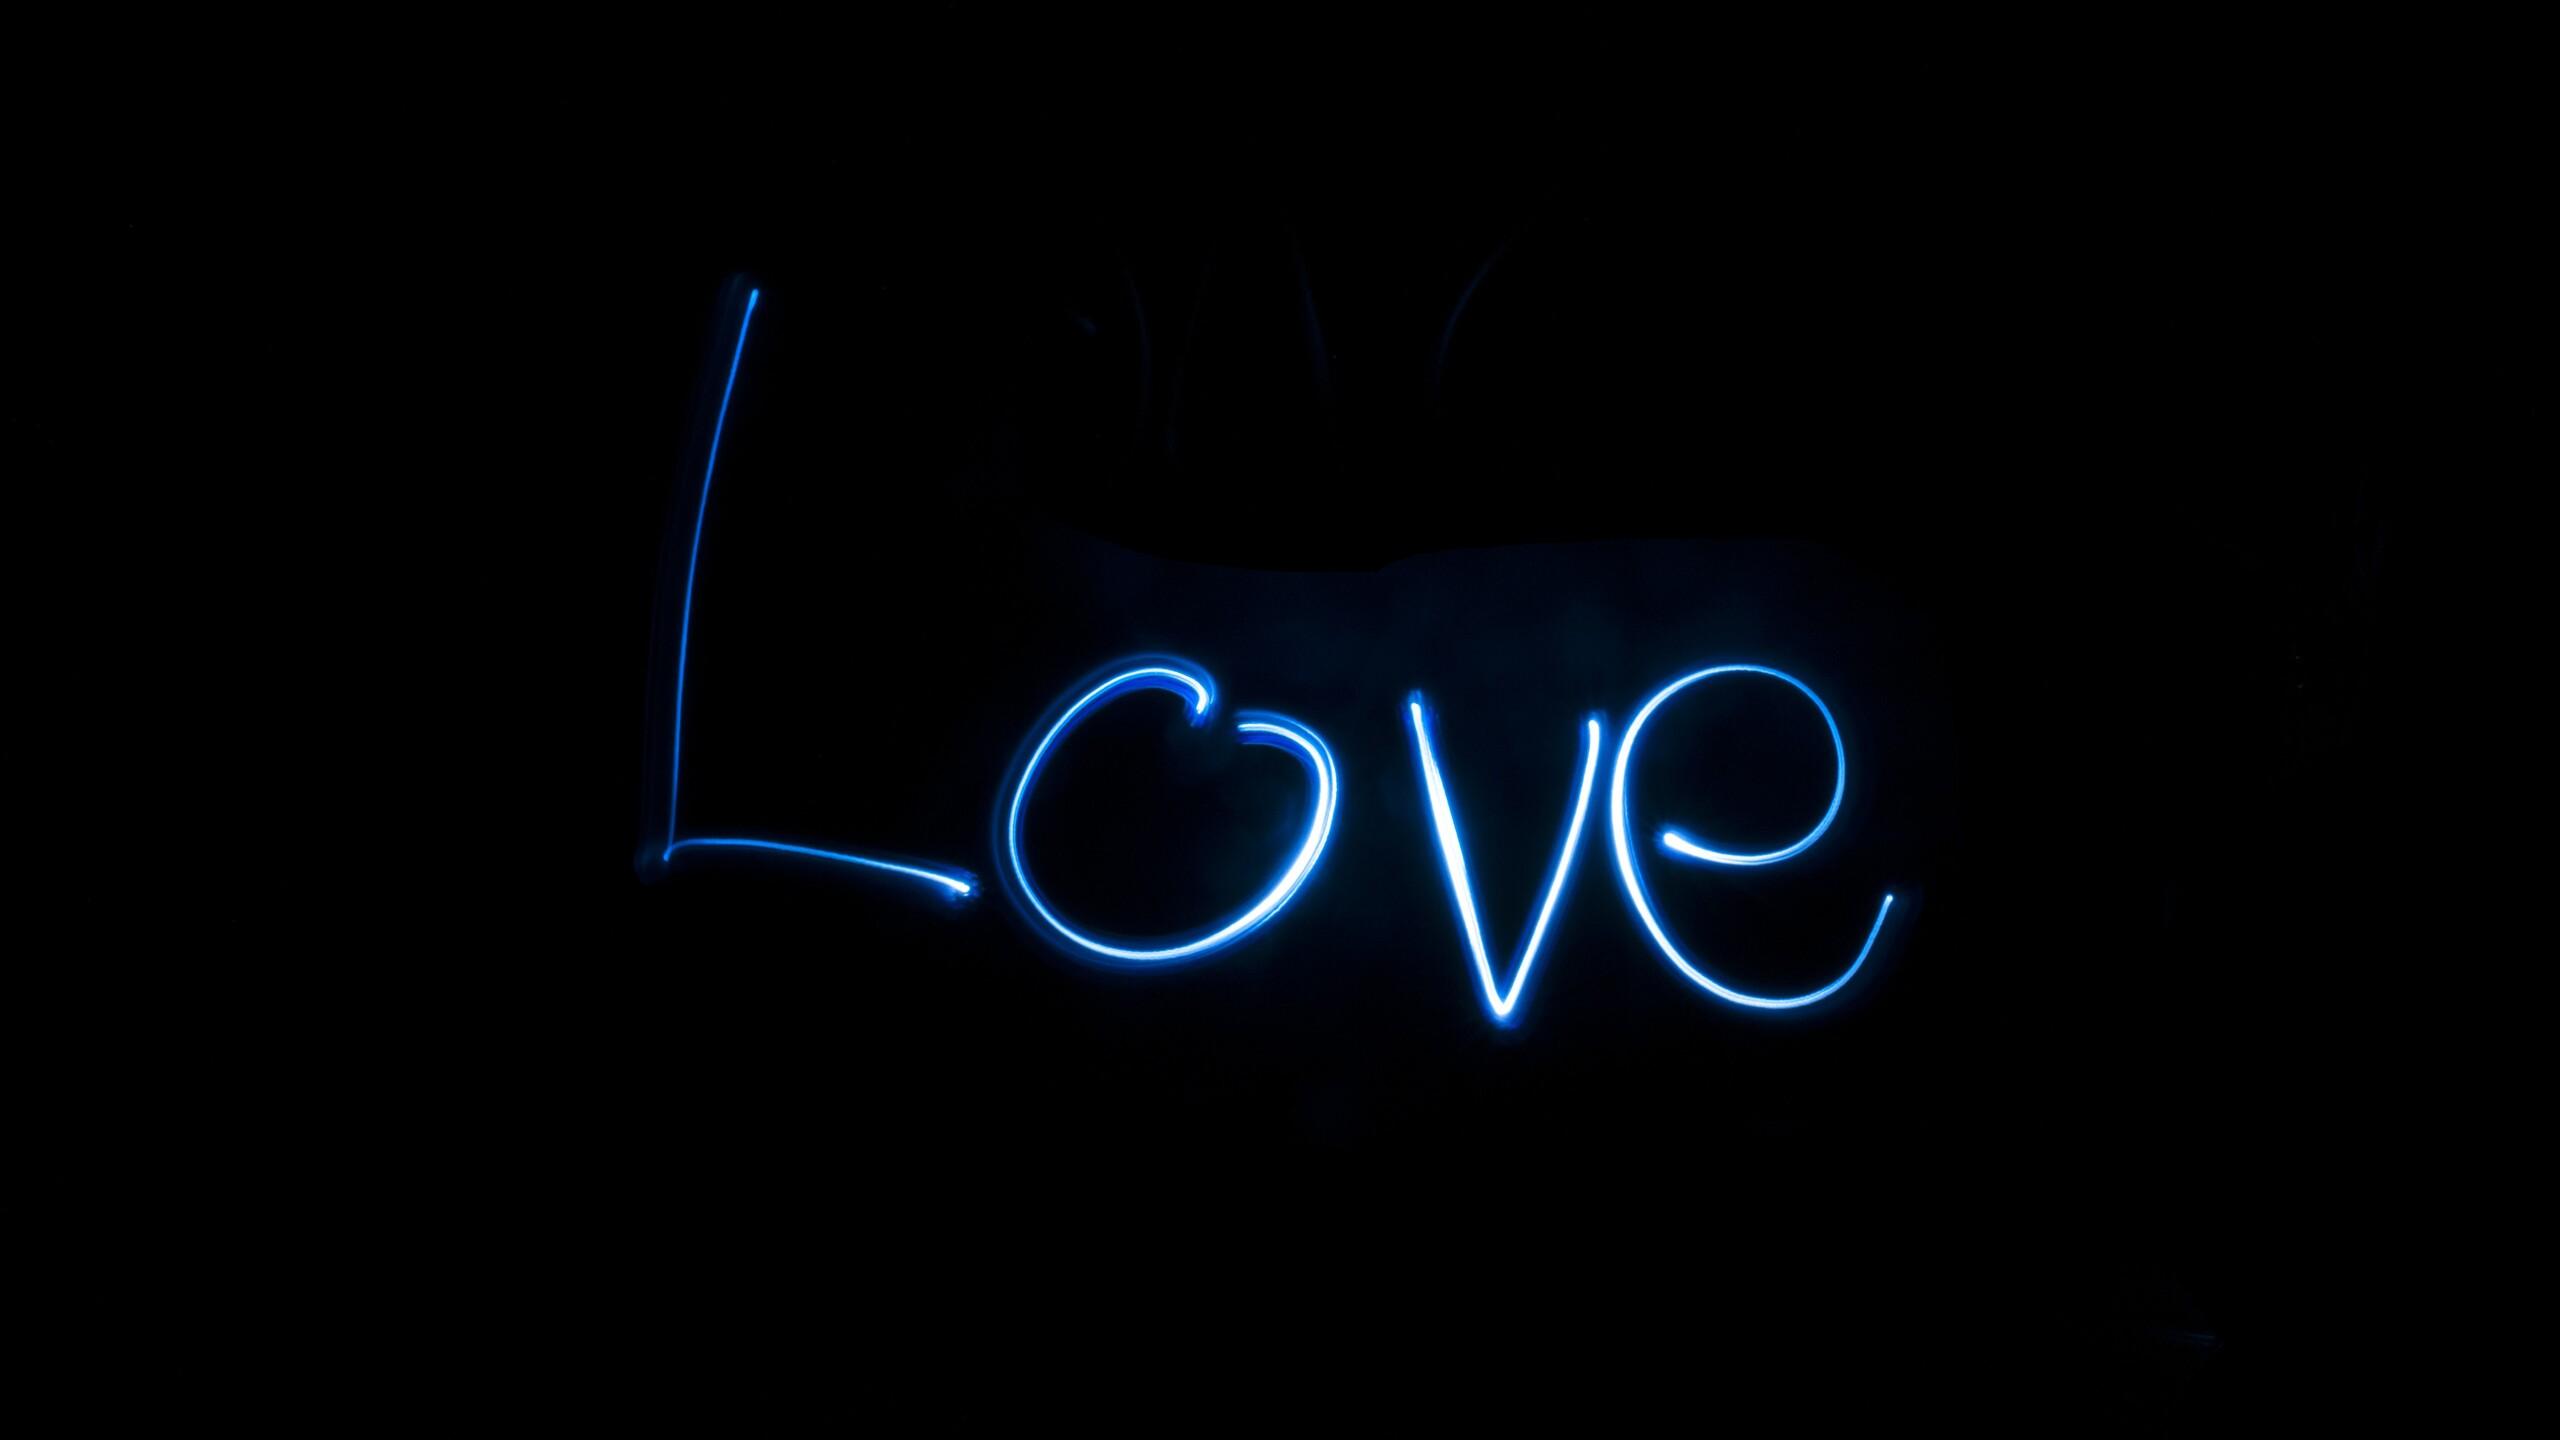 love-long-exposure-typography-b5.jpg